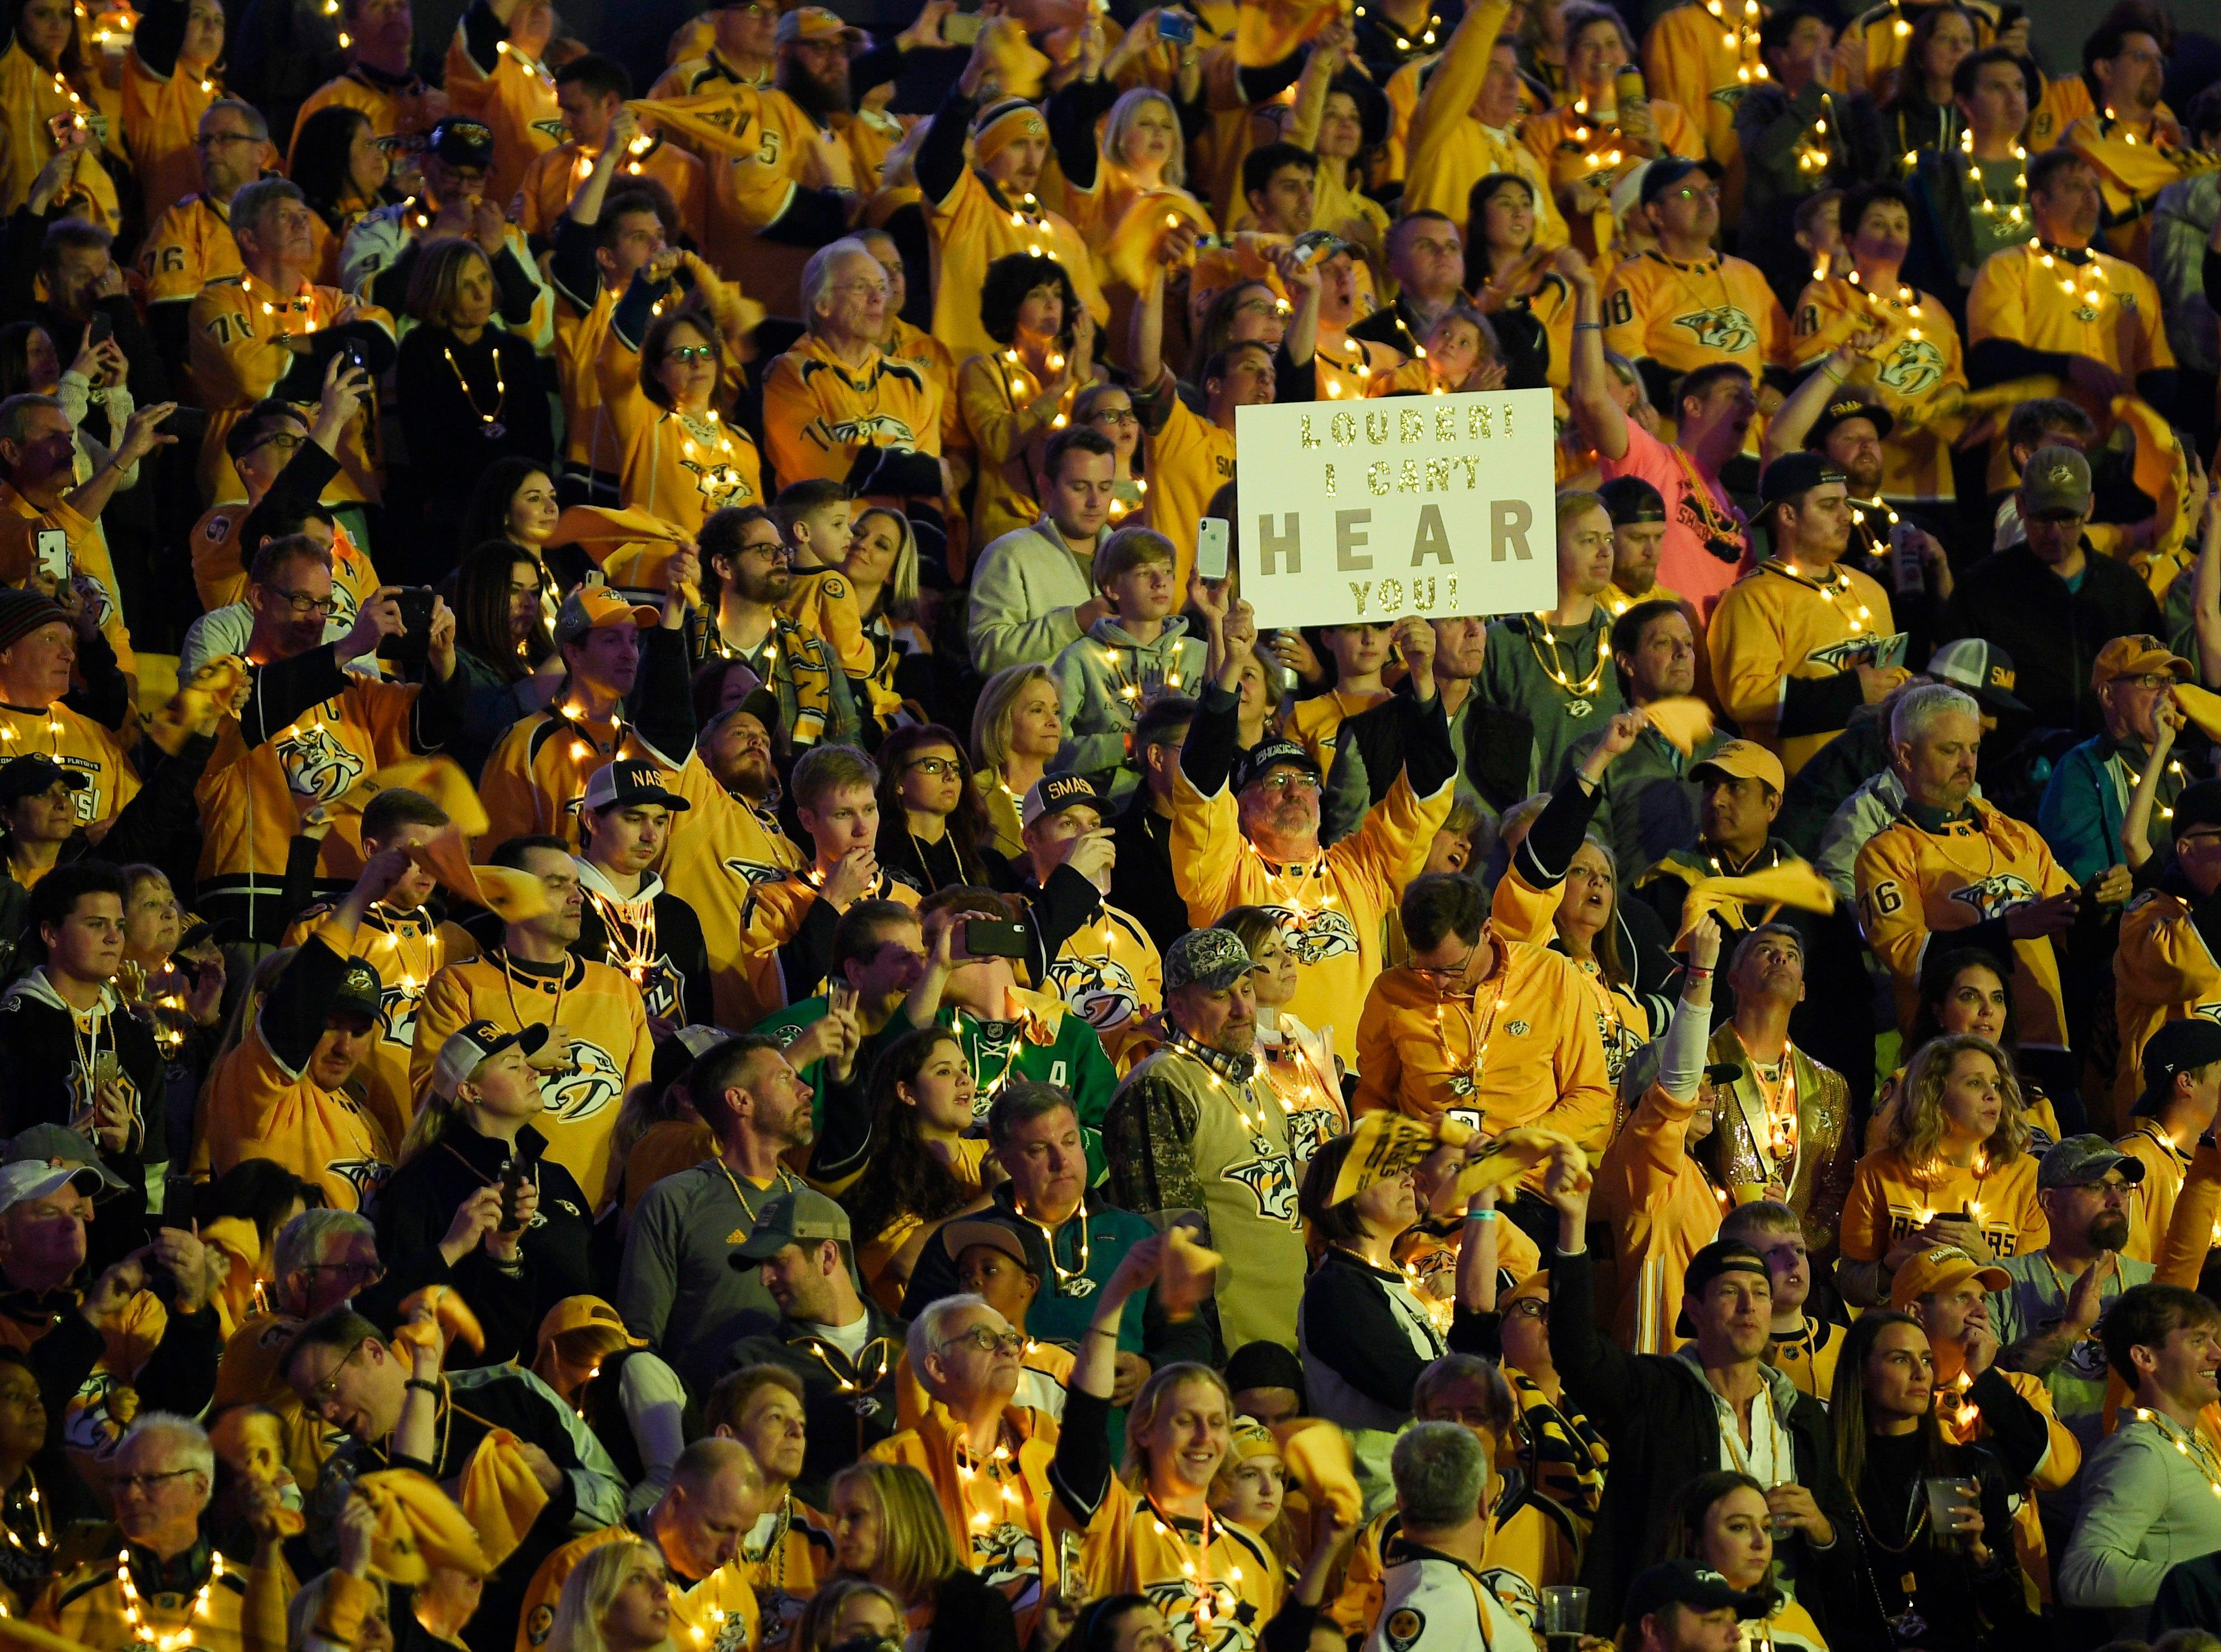 Predators fan cheer during the first period of the divisional semifinal game at Bridgestone Arena in Nashville, Tenn., Saturday, April 13, 2019.